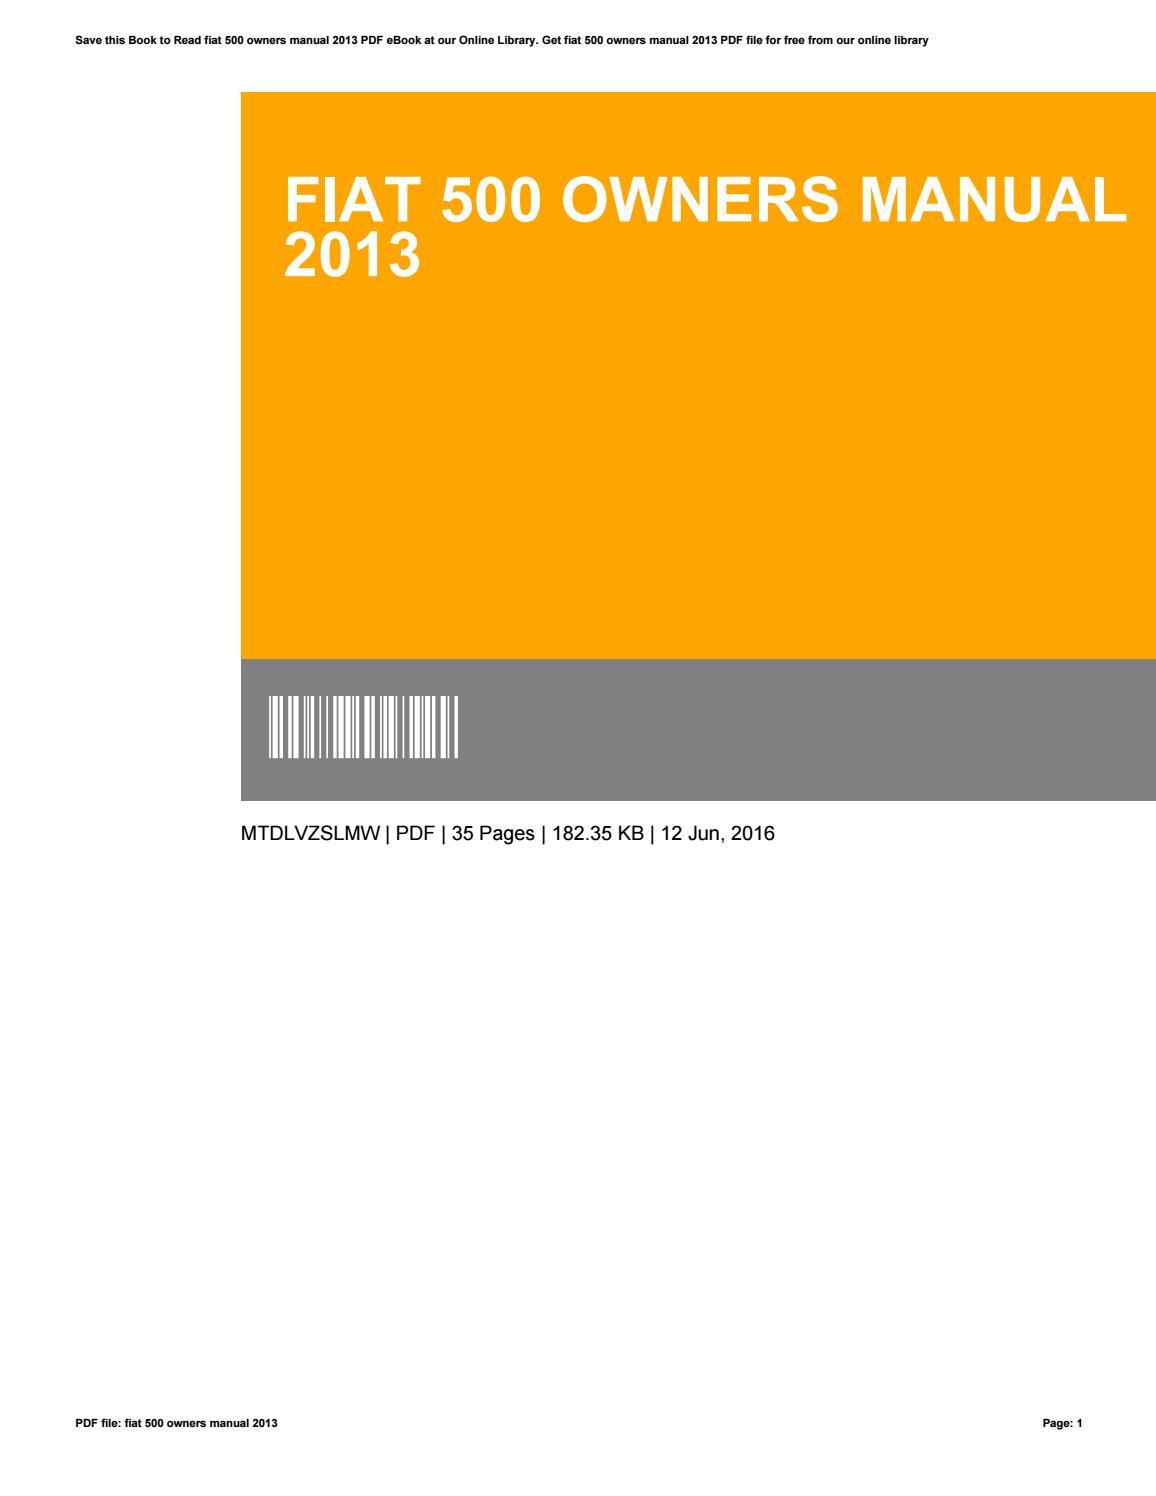 fiat 500 sport owners manual ebook